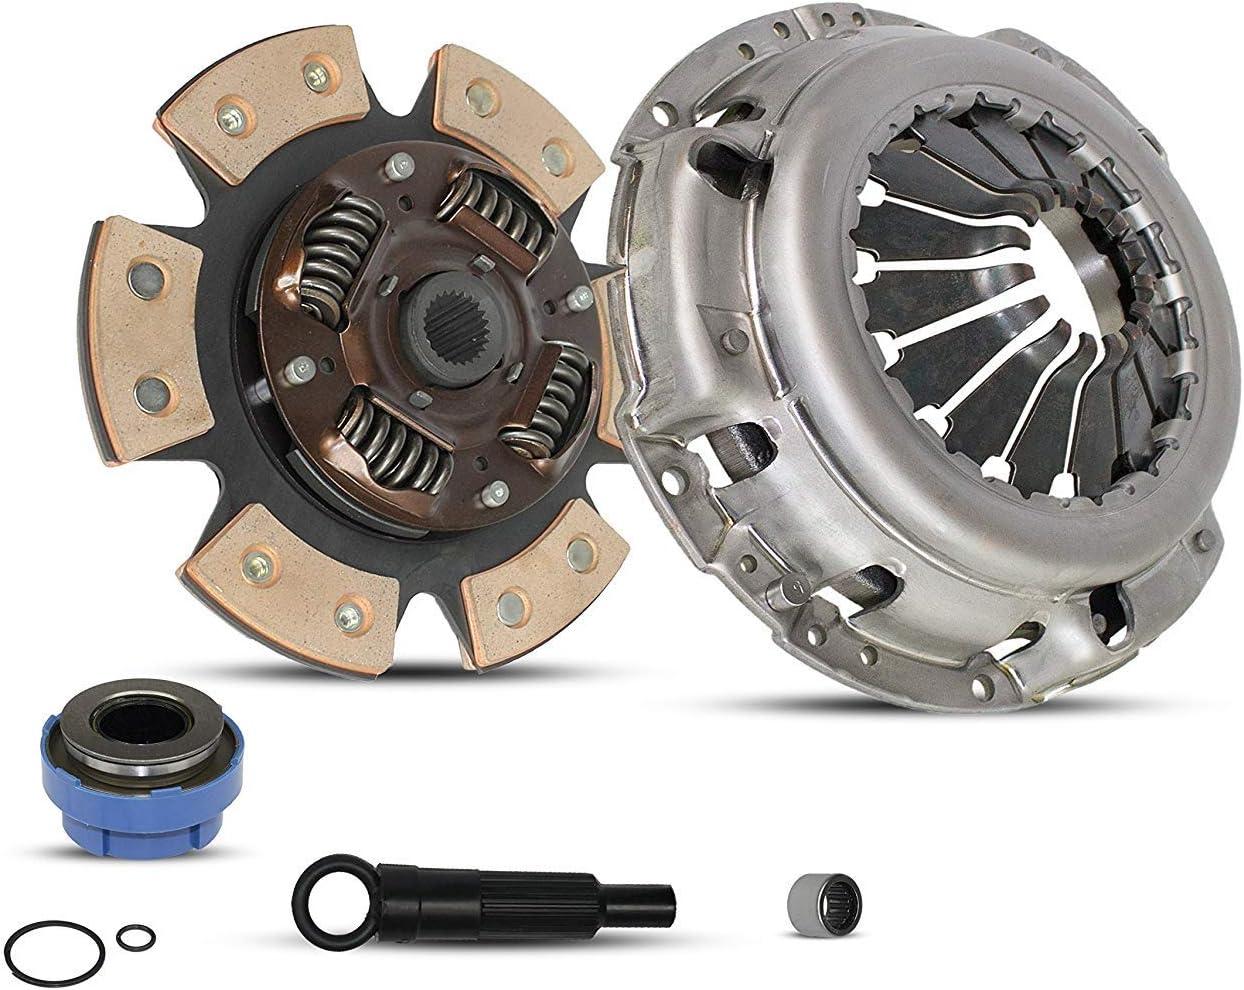 Clutch And Slave Kit Works With Ford Ranger Mazda B2300 B2500 B3000 Bse Xl Xlt Limited Sport Stx Ds 1995-2011 2.3L L4 Gas Dohc 2.5L Gas Sohc L4 3.0L V6 Gas Ovh Self-Adjusting Clutch Cover